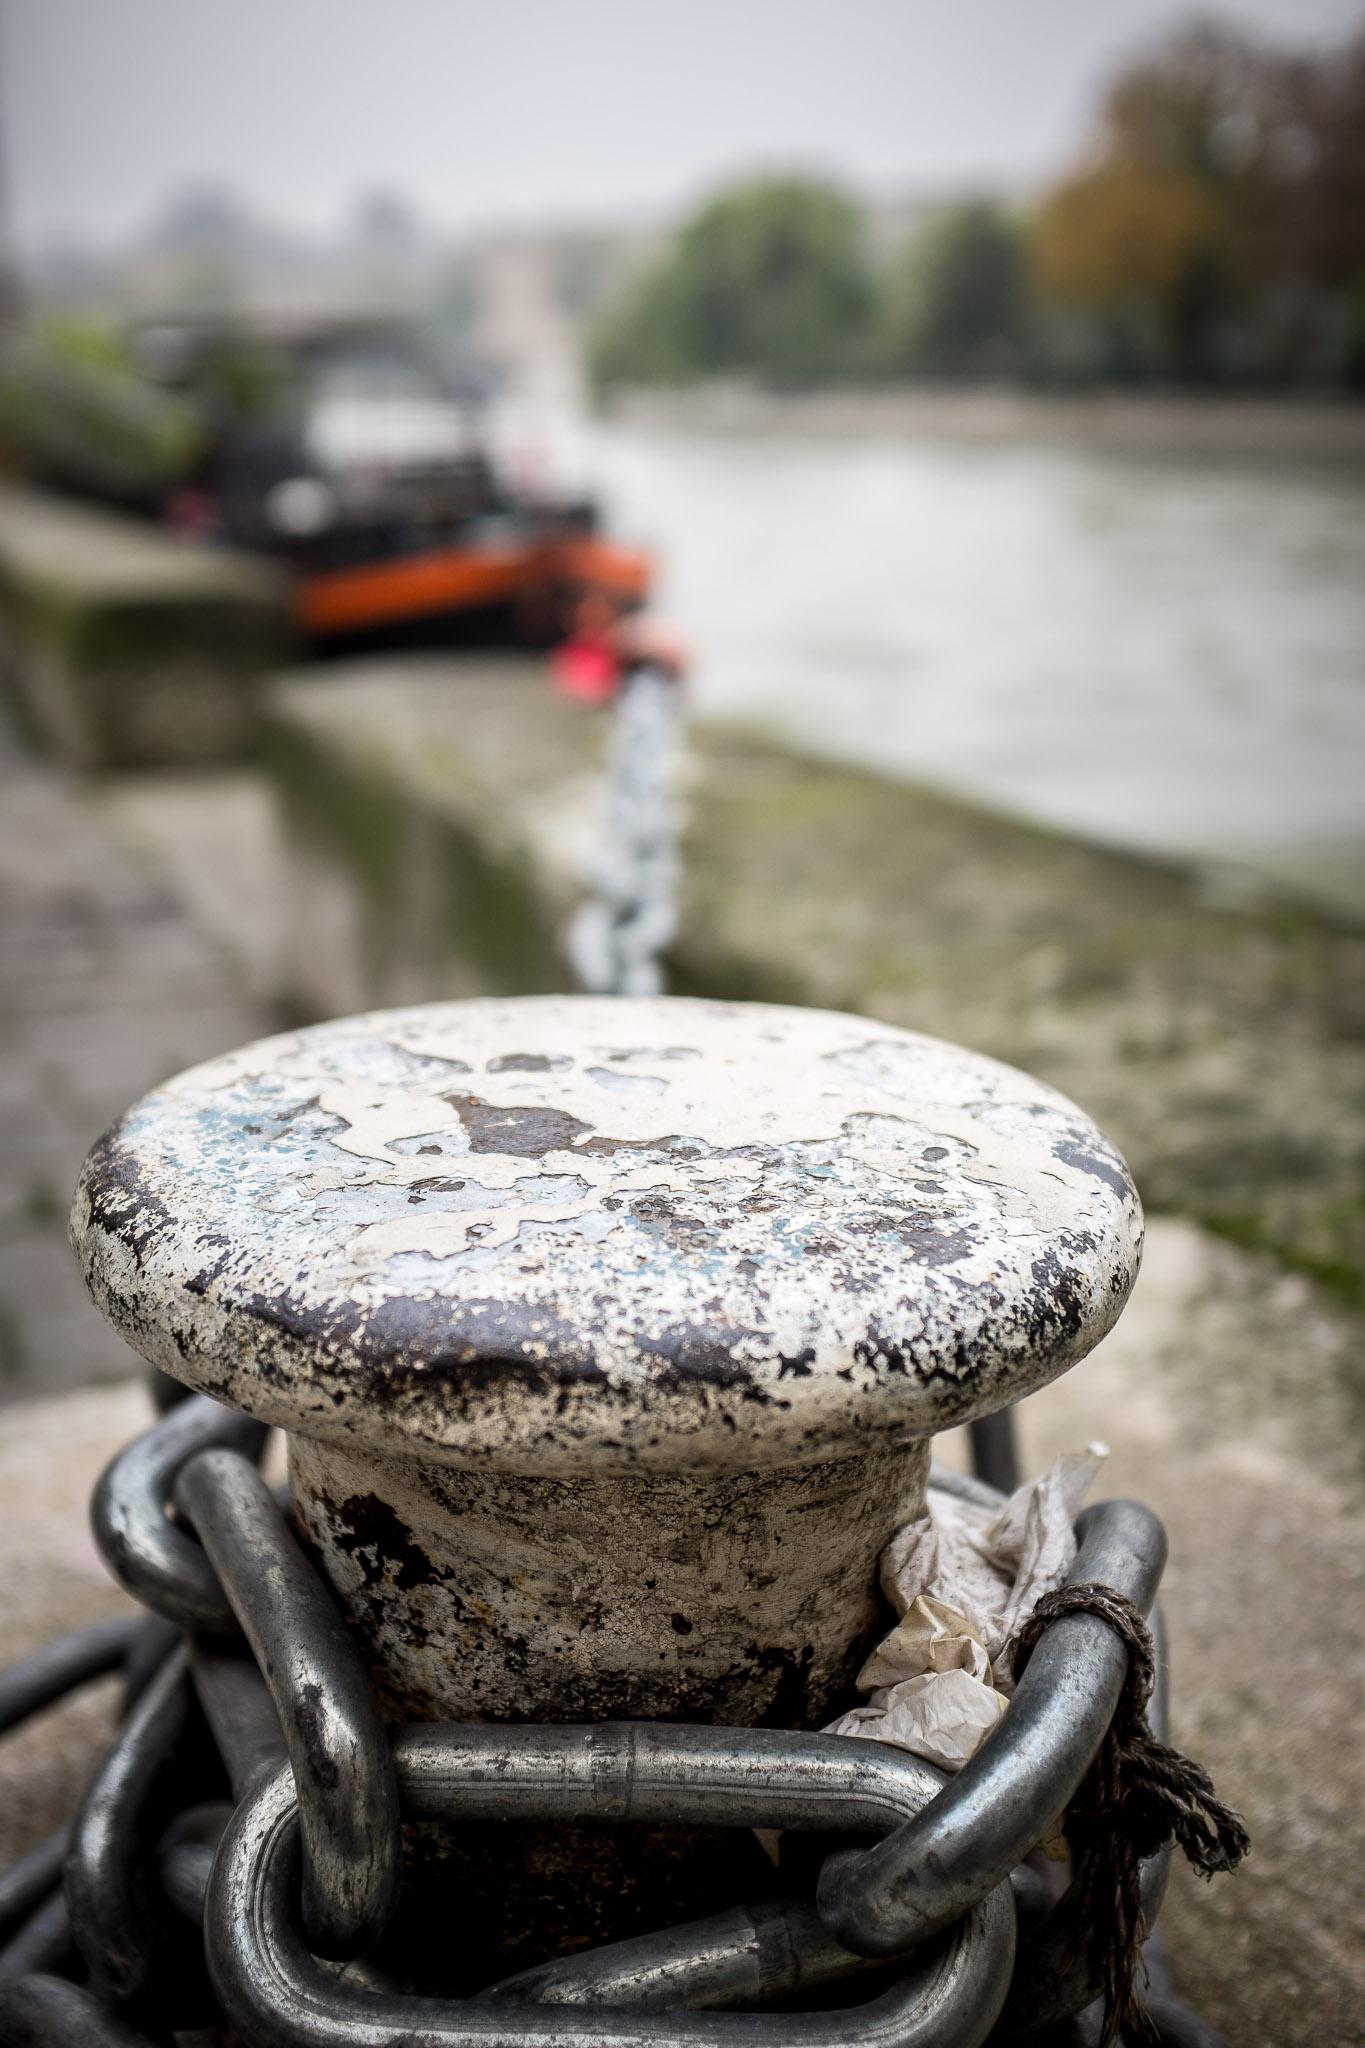 Boat mooring on the River Seine, Paris